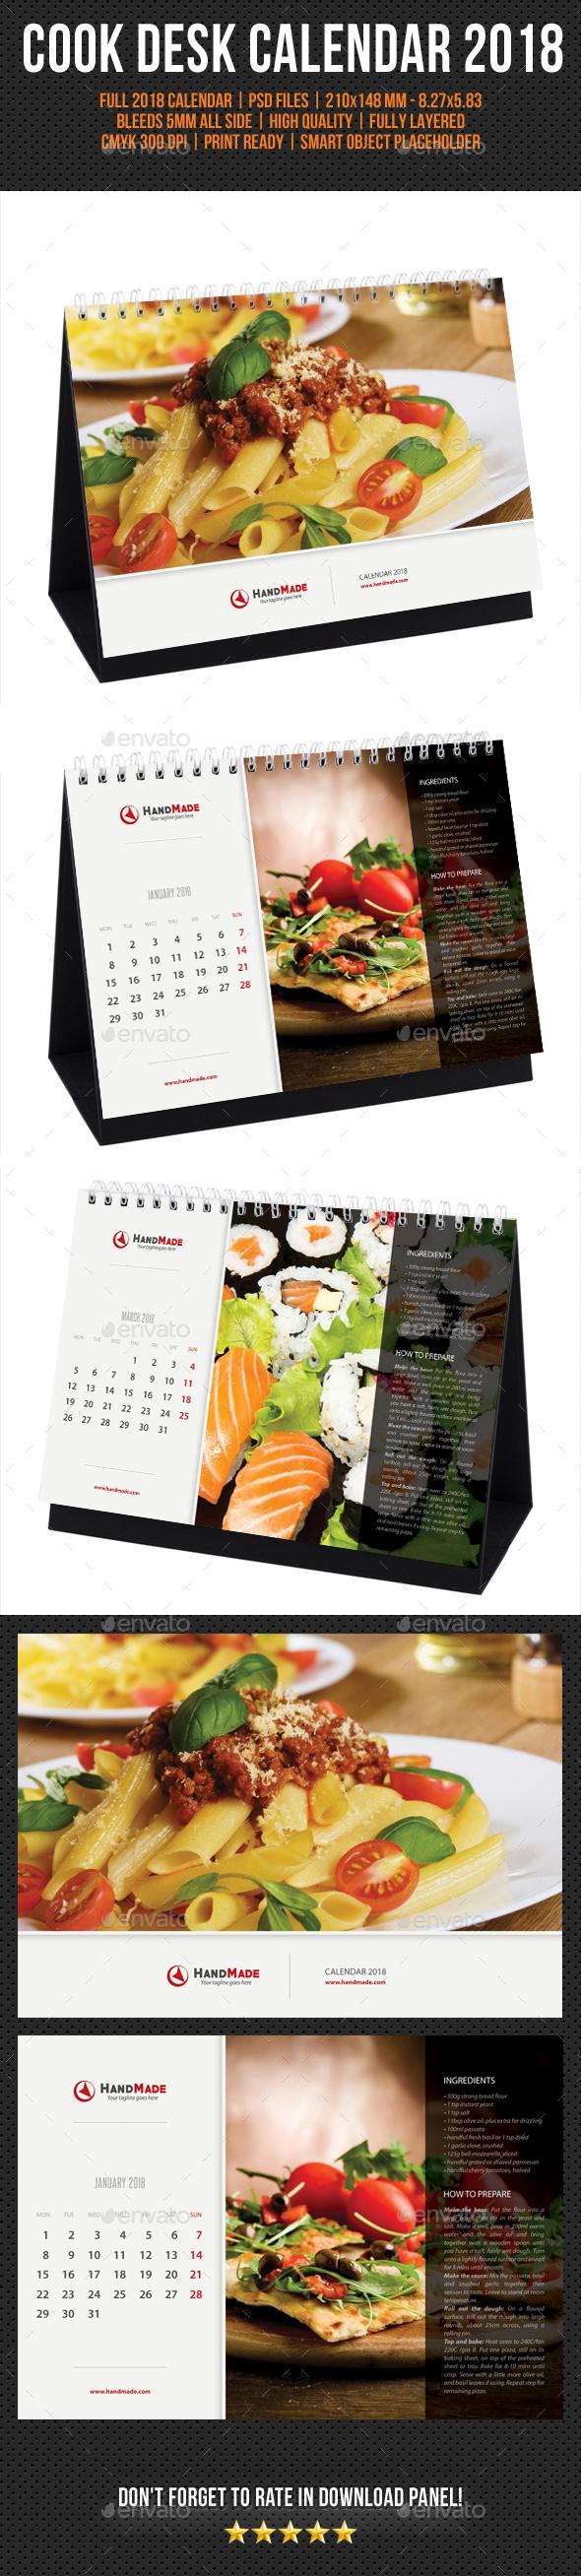 Cook And Food Desk Calendar 2018 - Calendars Stationery